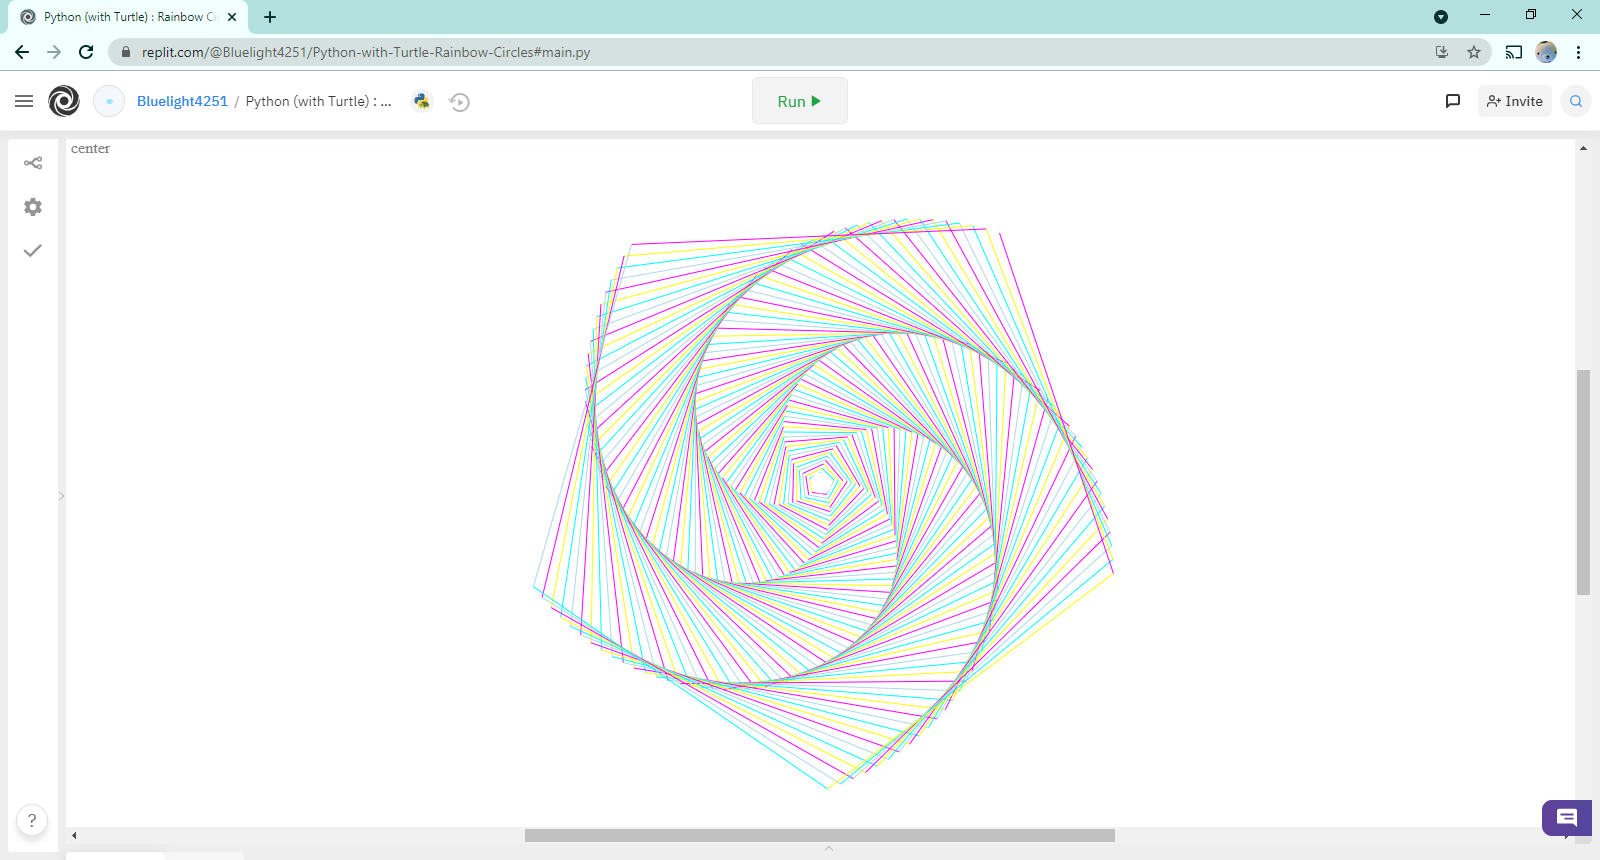 Python (with Turtle) :  Rainbow Circles